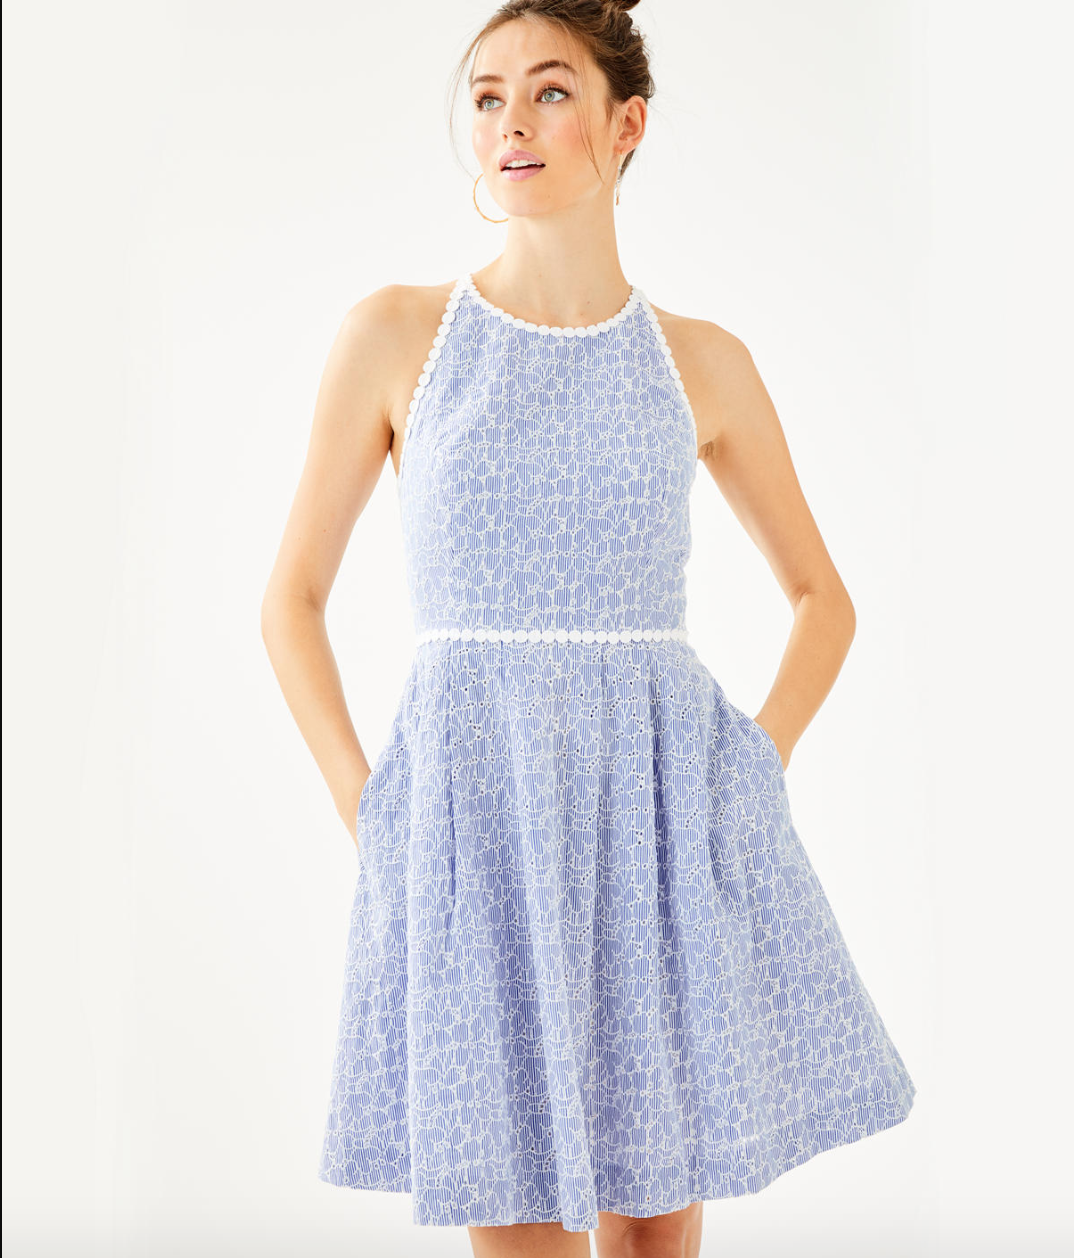 3345e3d8f1 TORI DRESS - CREW BLUE TINT YARN DYE STRIPE FLORAL EYELET - Lilly ...